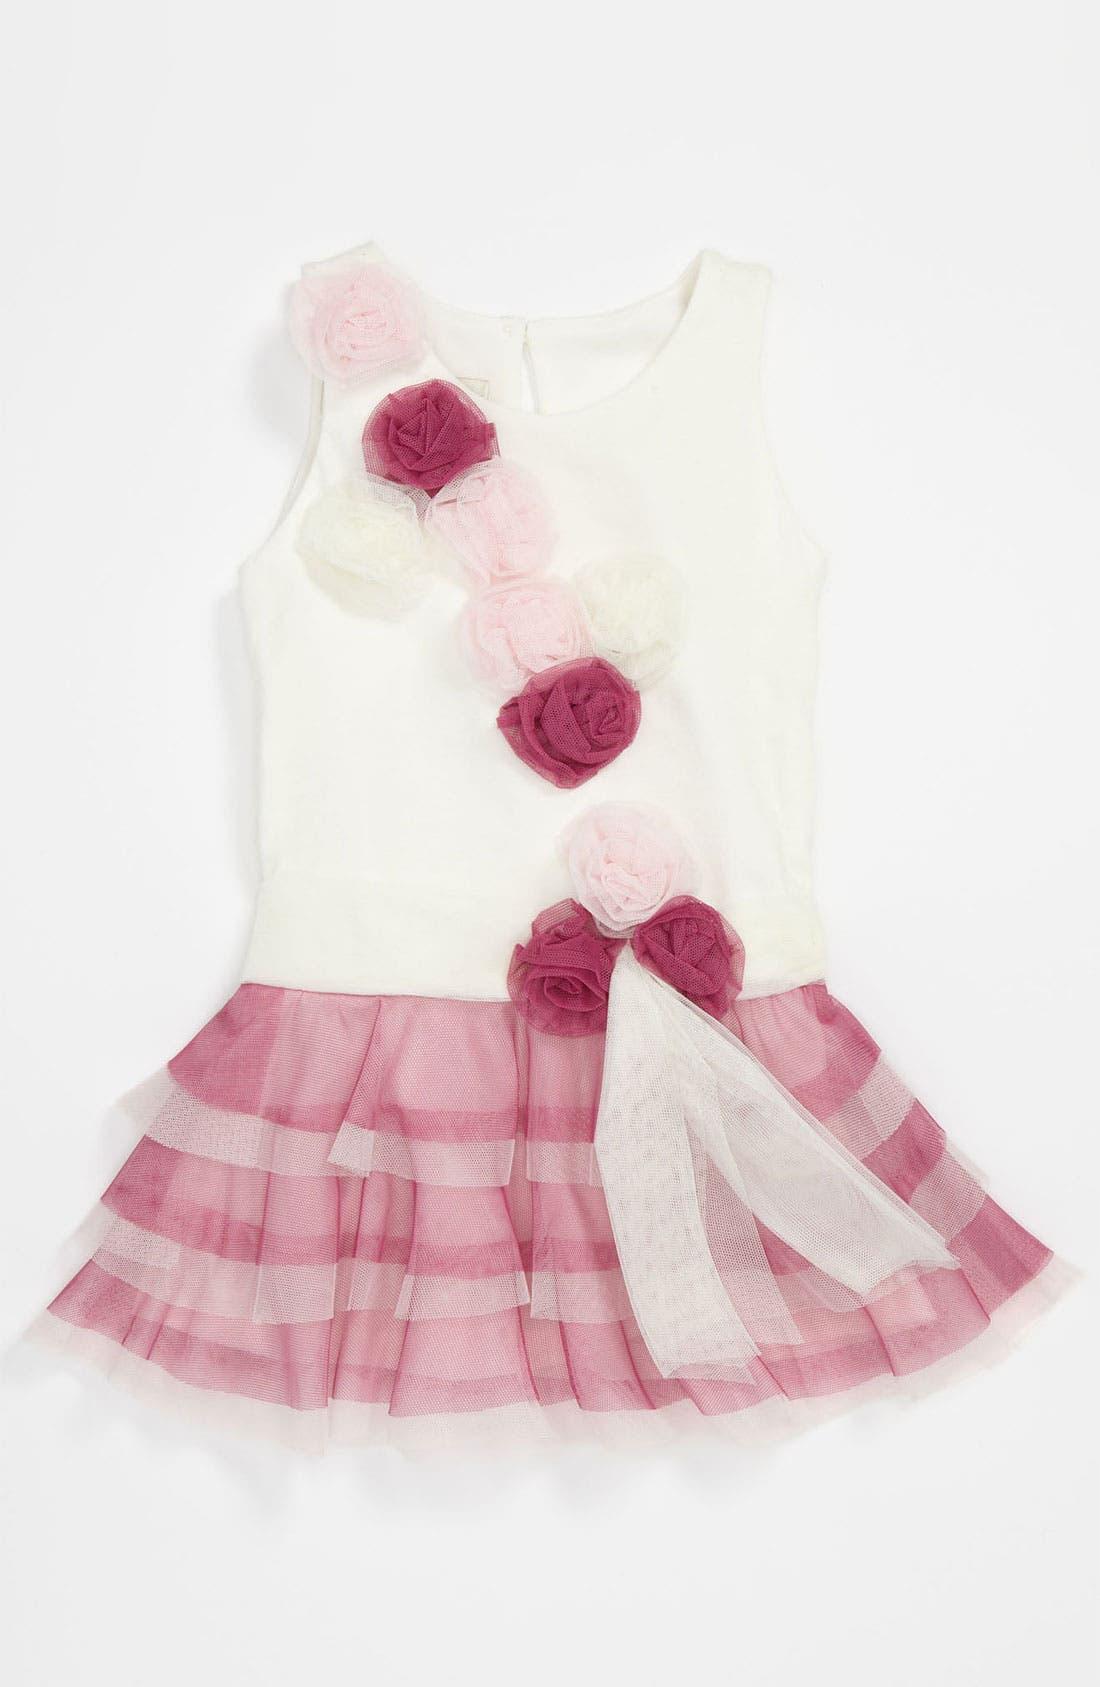 Main Image - Isobella & Chloe Cotton & Tulle Dress (Baby)